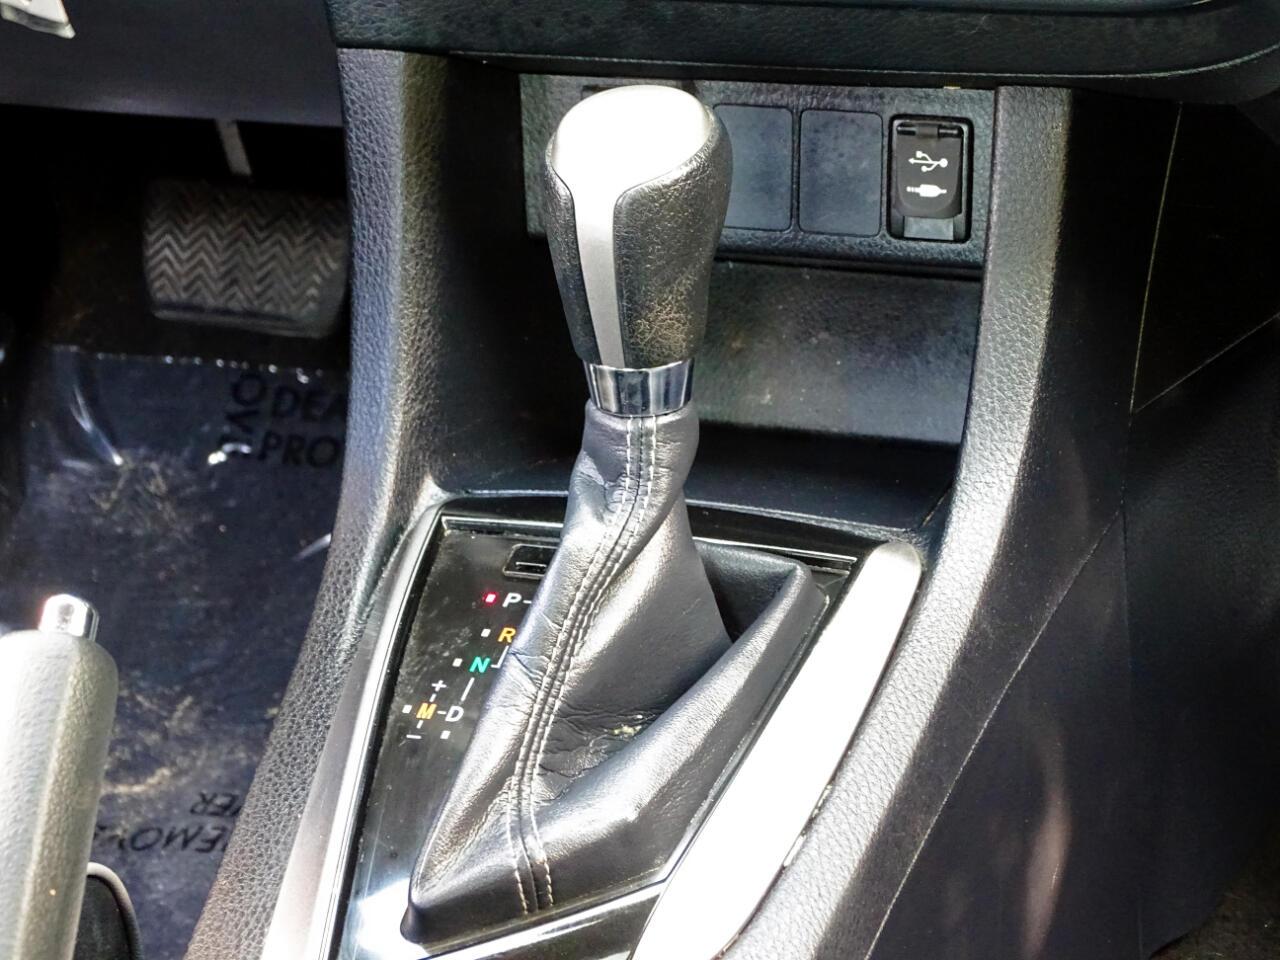 2016 Toyota Corolla 4dr Sdn CVT S Plus (Natl)